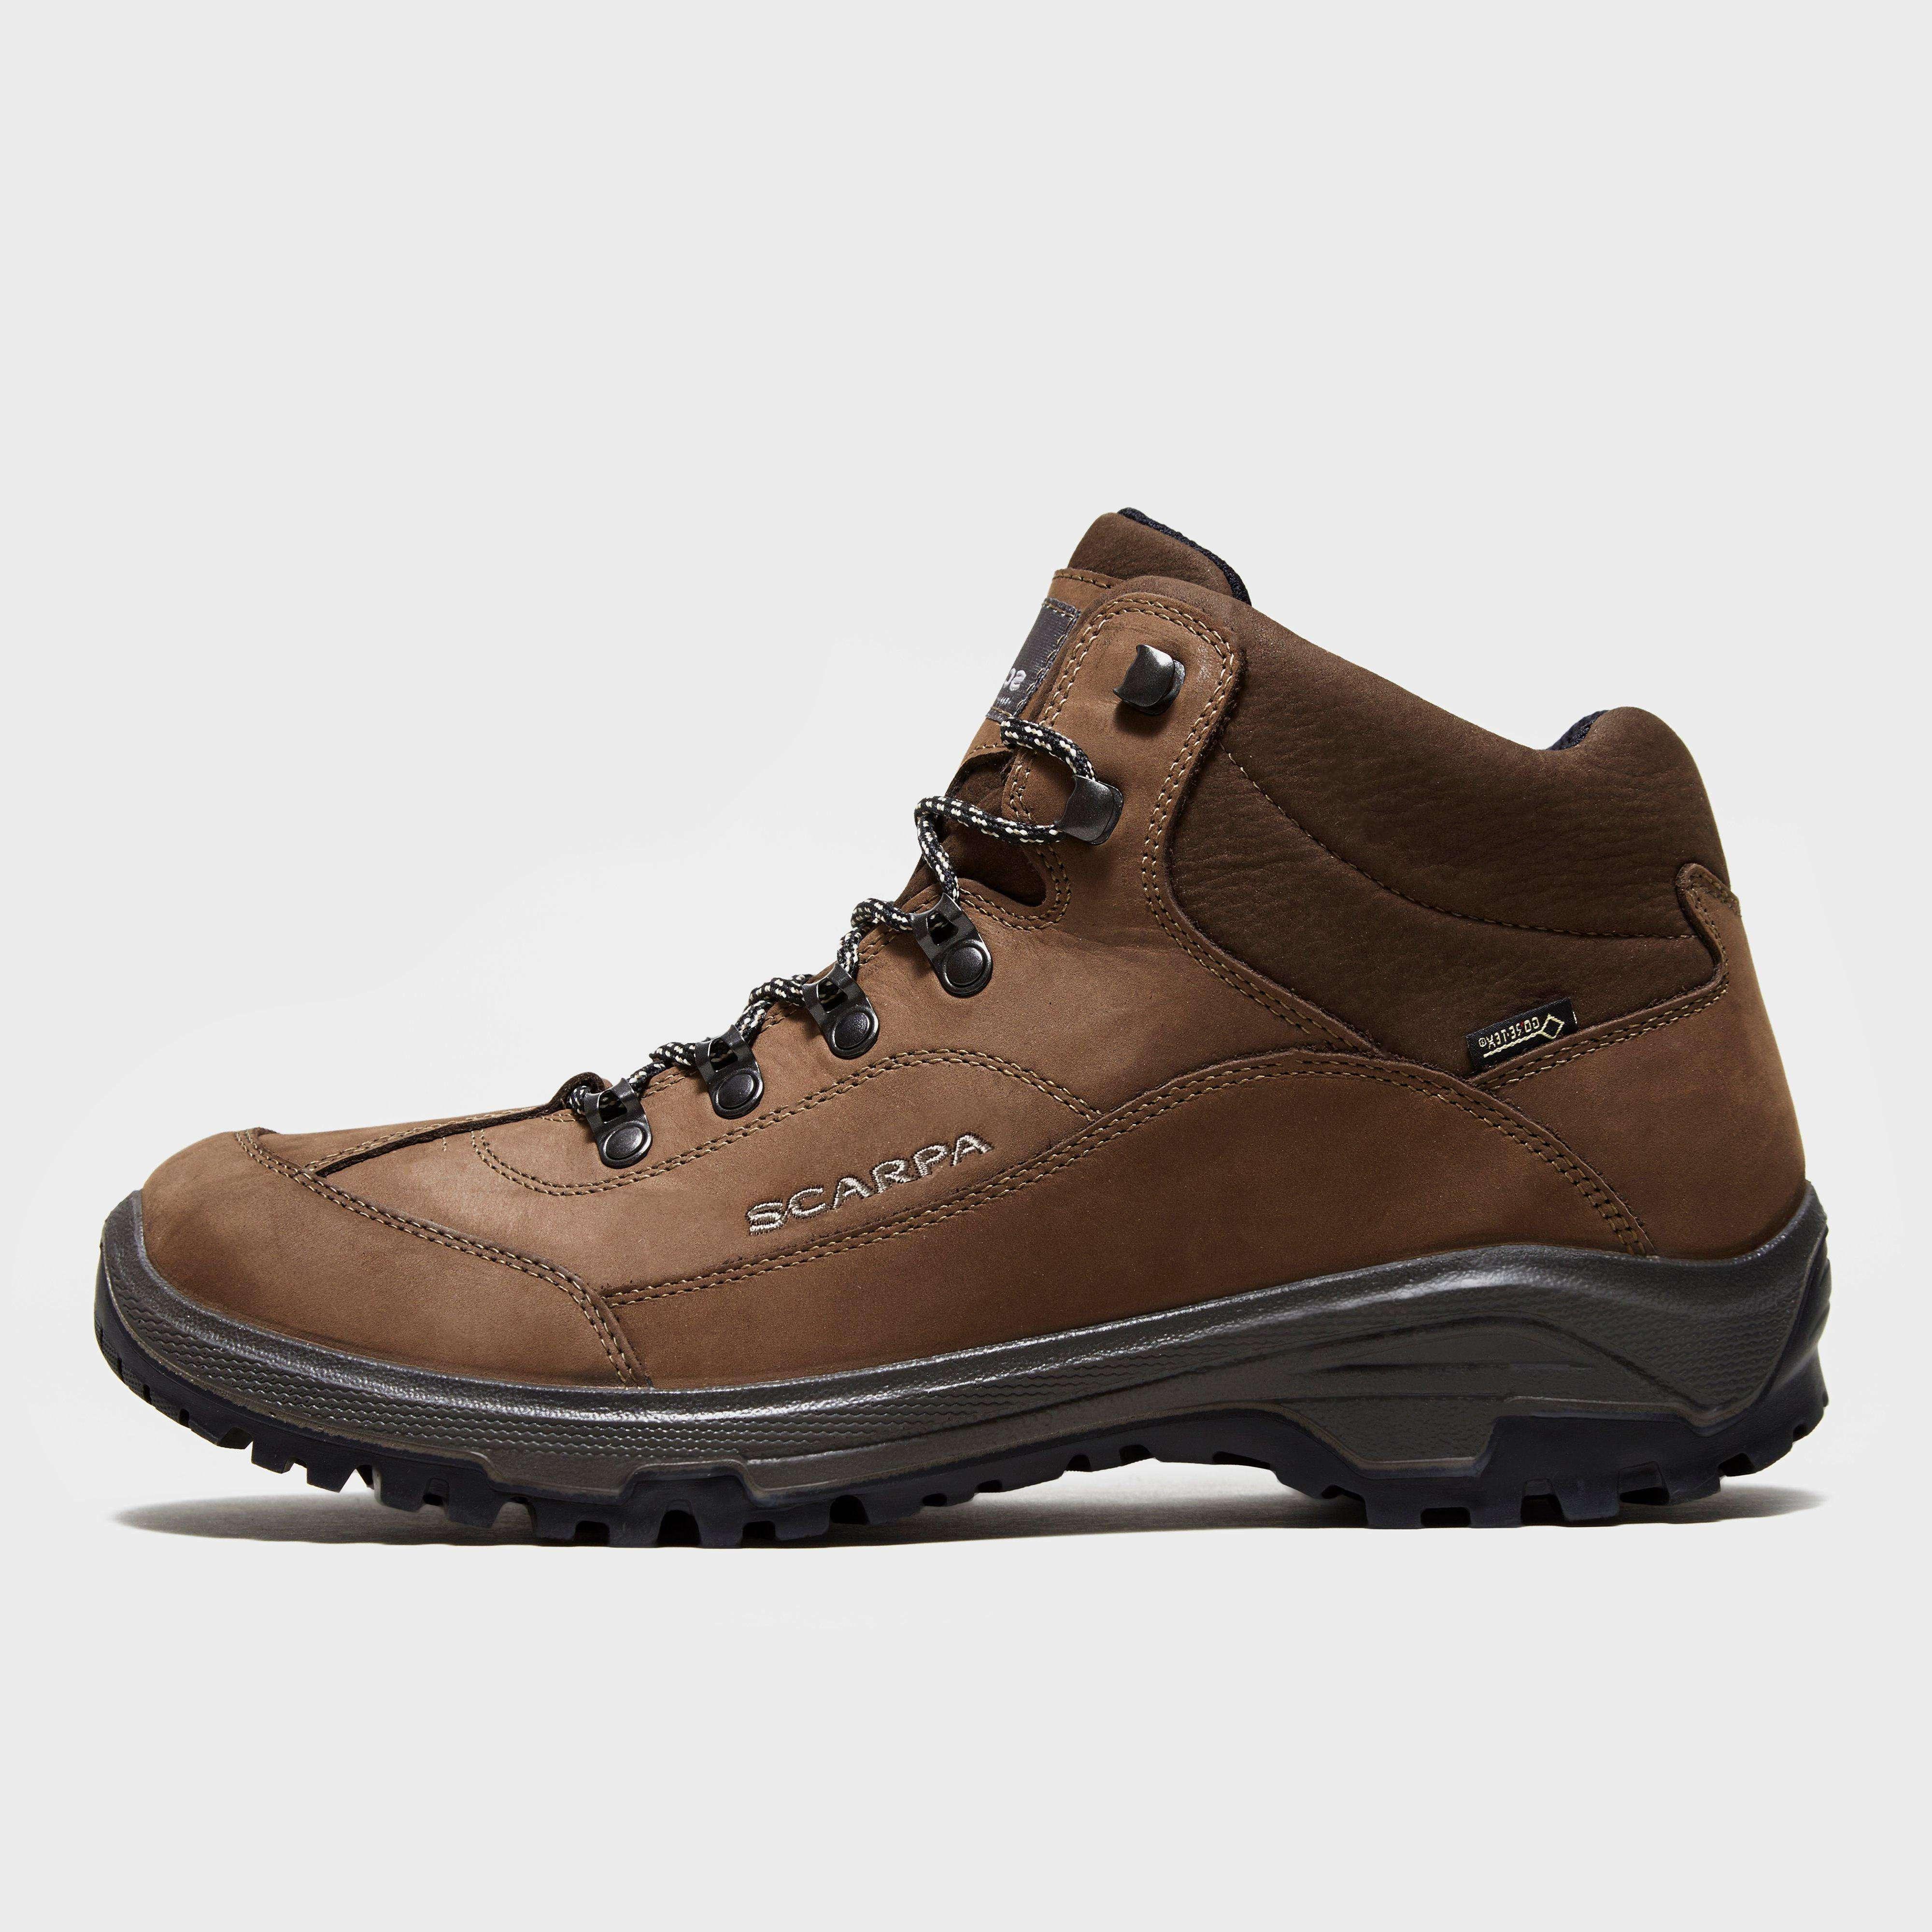 SCARPA Men's Cyrus Mid GORE-TEX® Boot